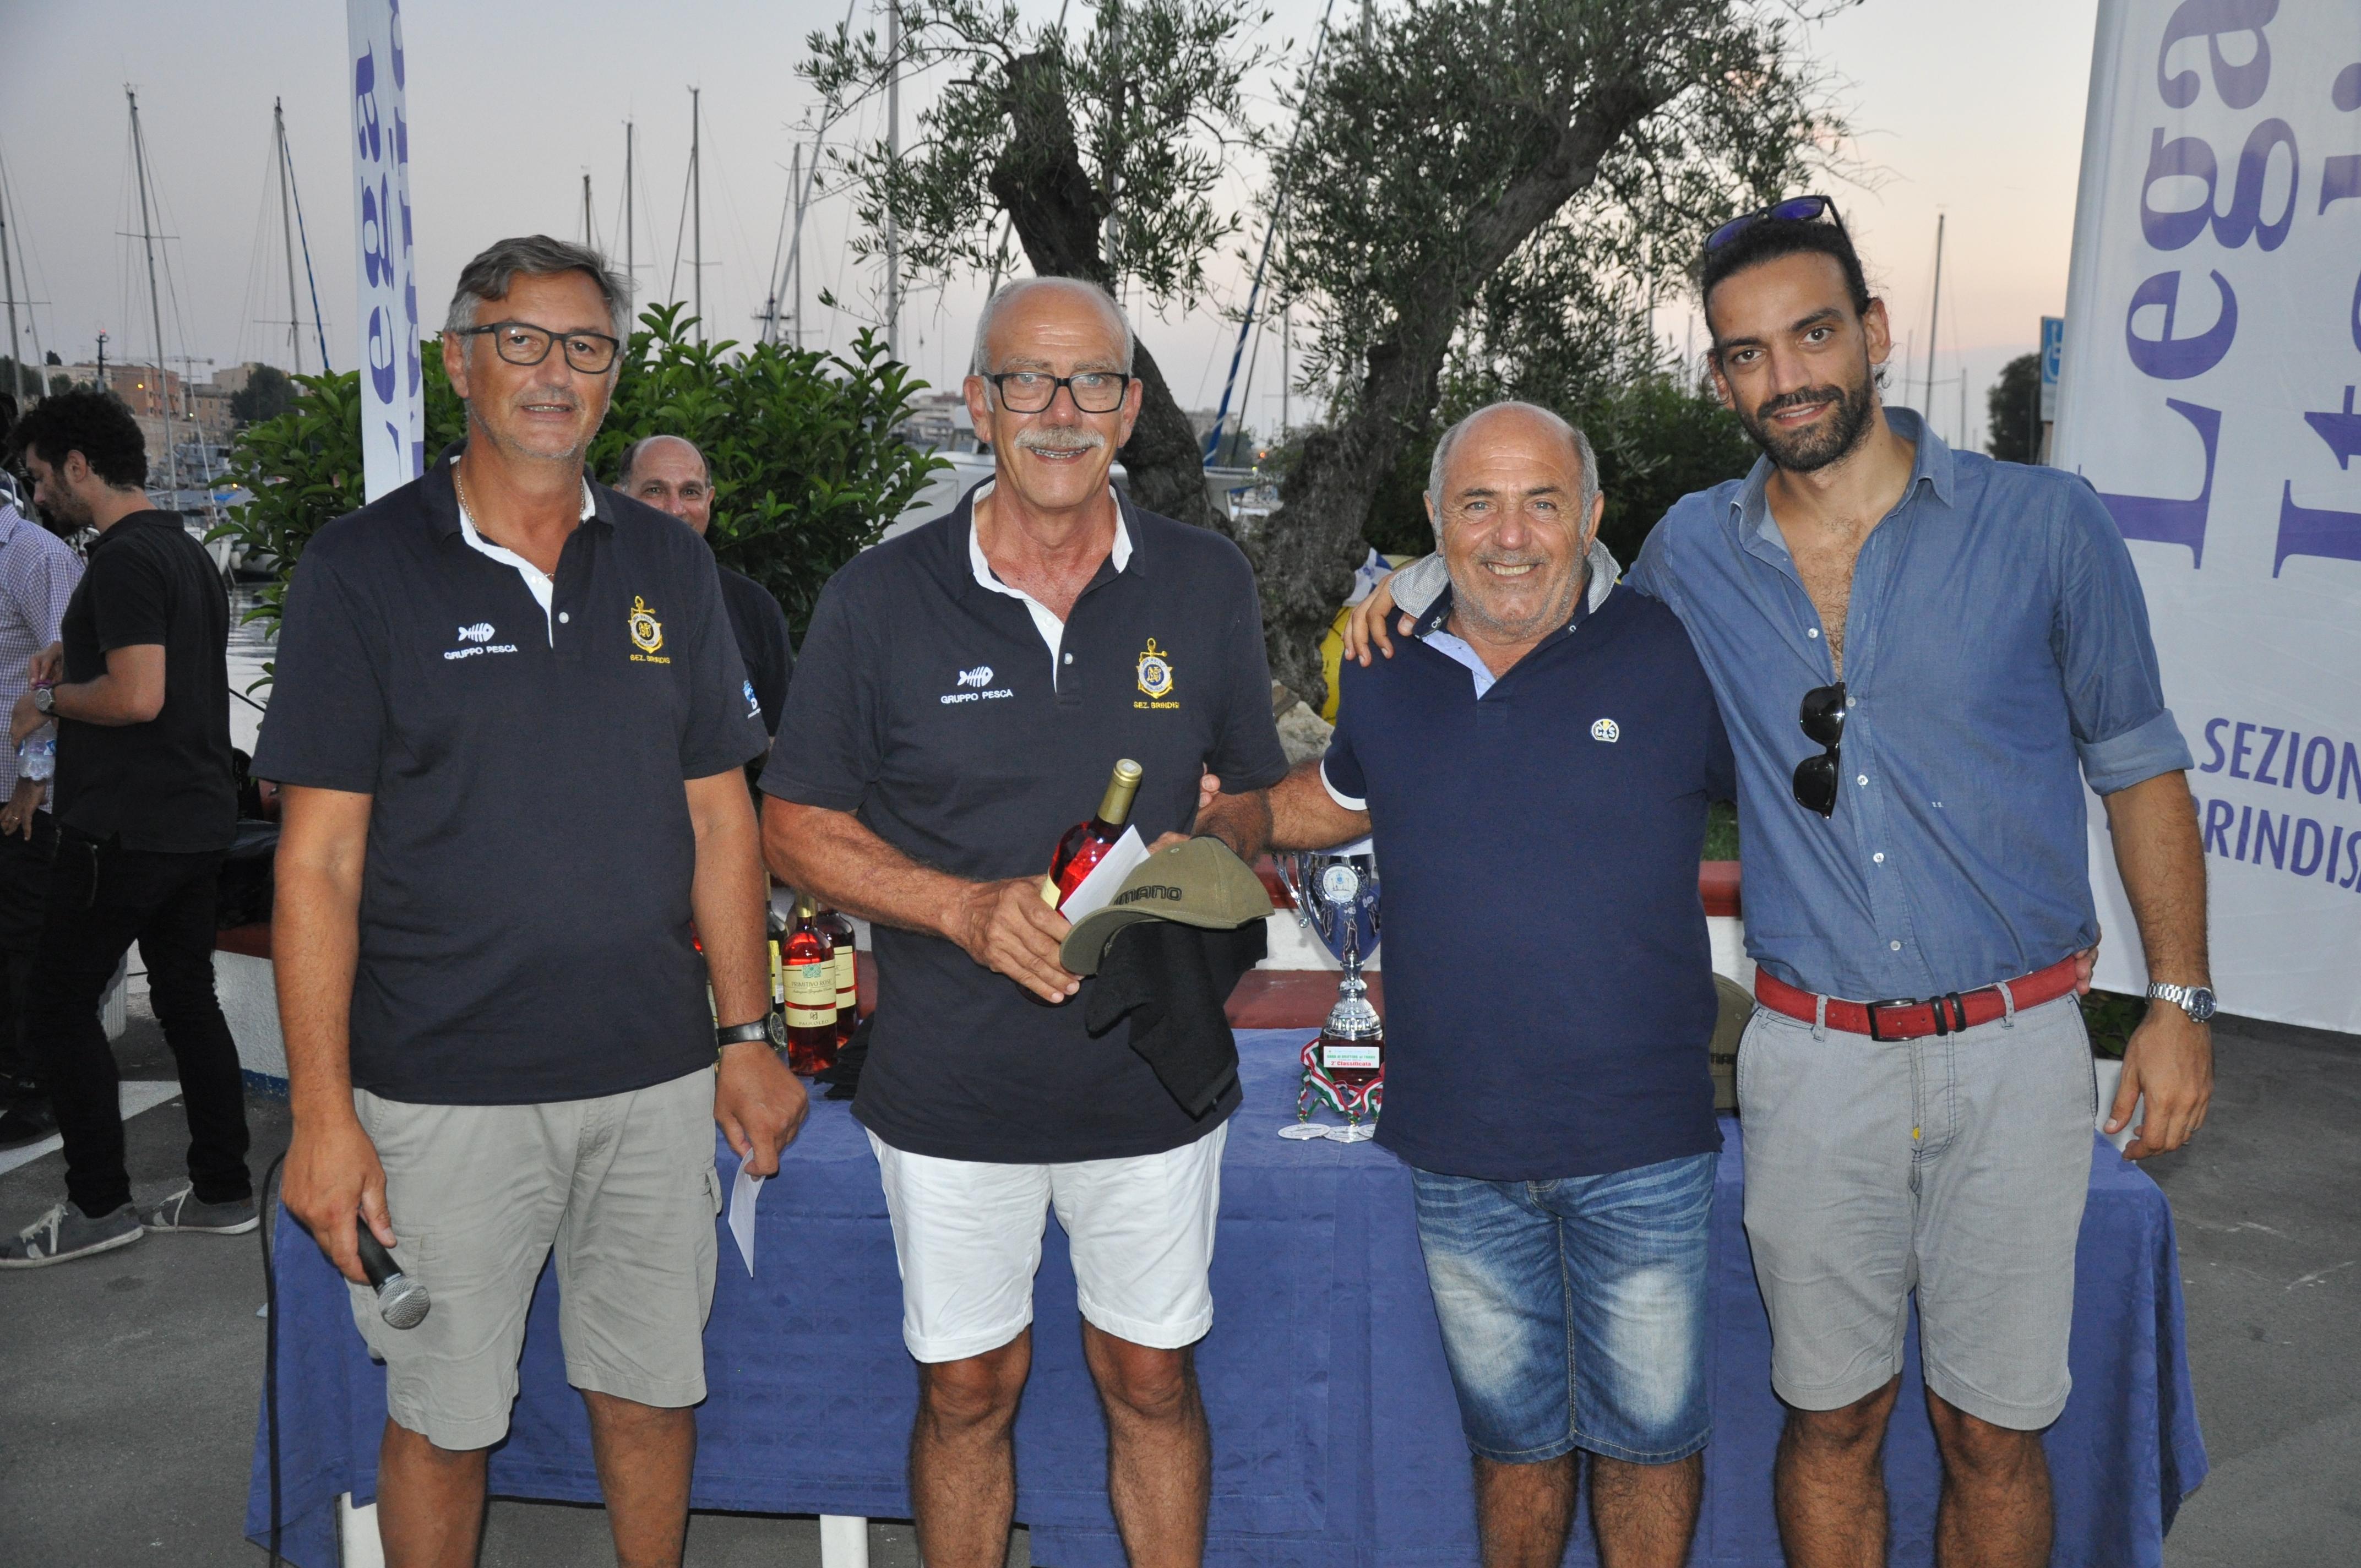 premiazione drifting al tonno 2018 (5)